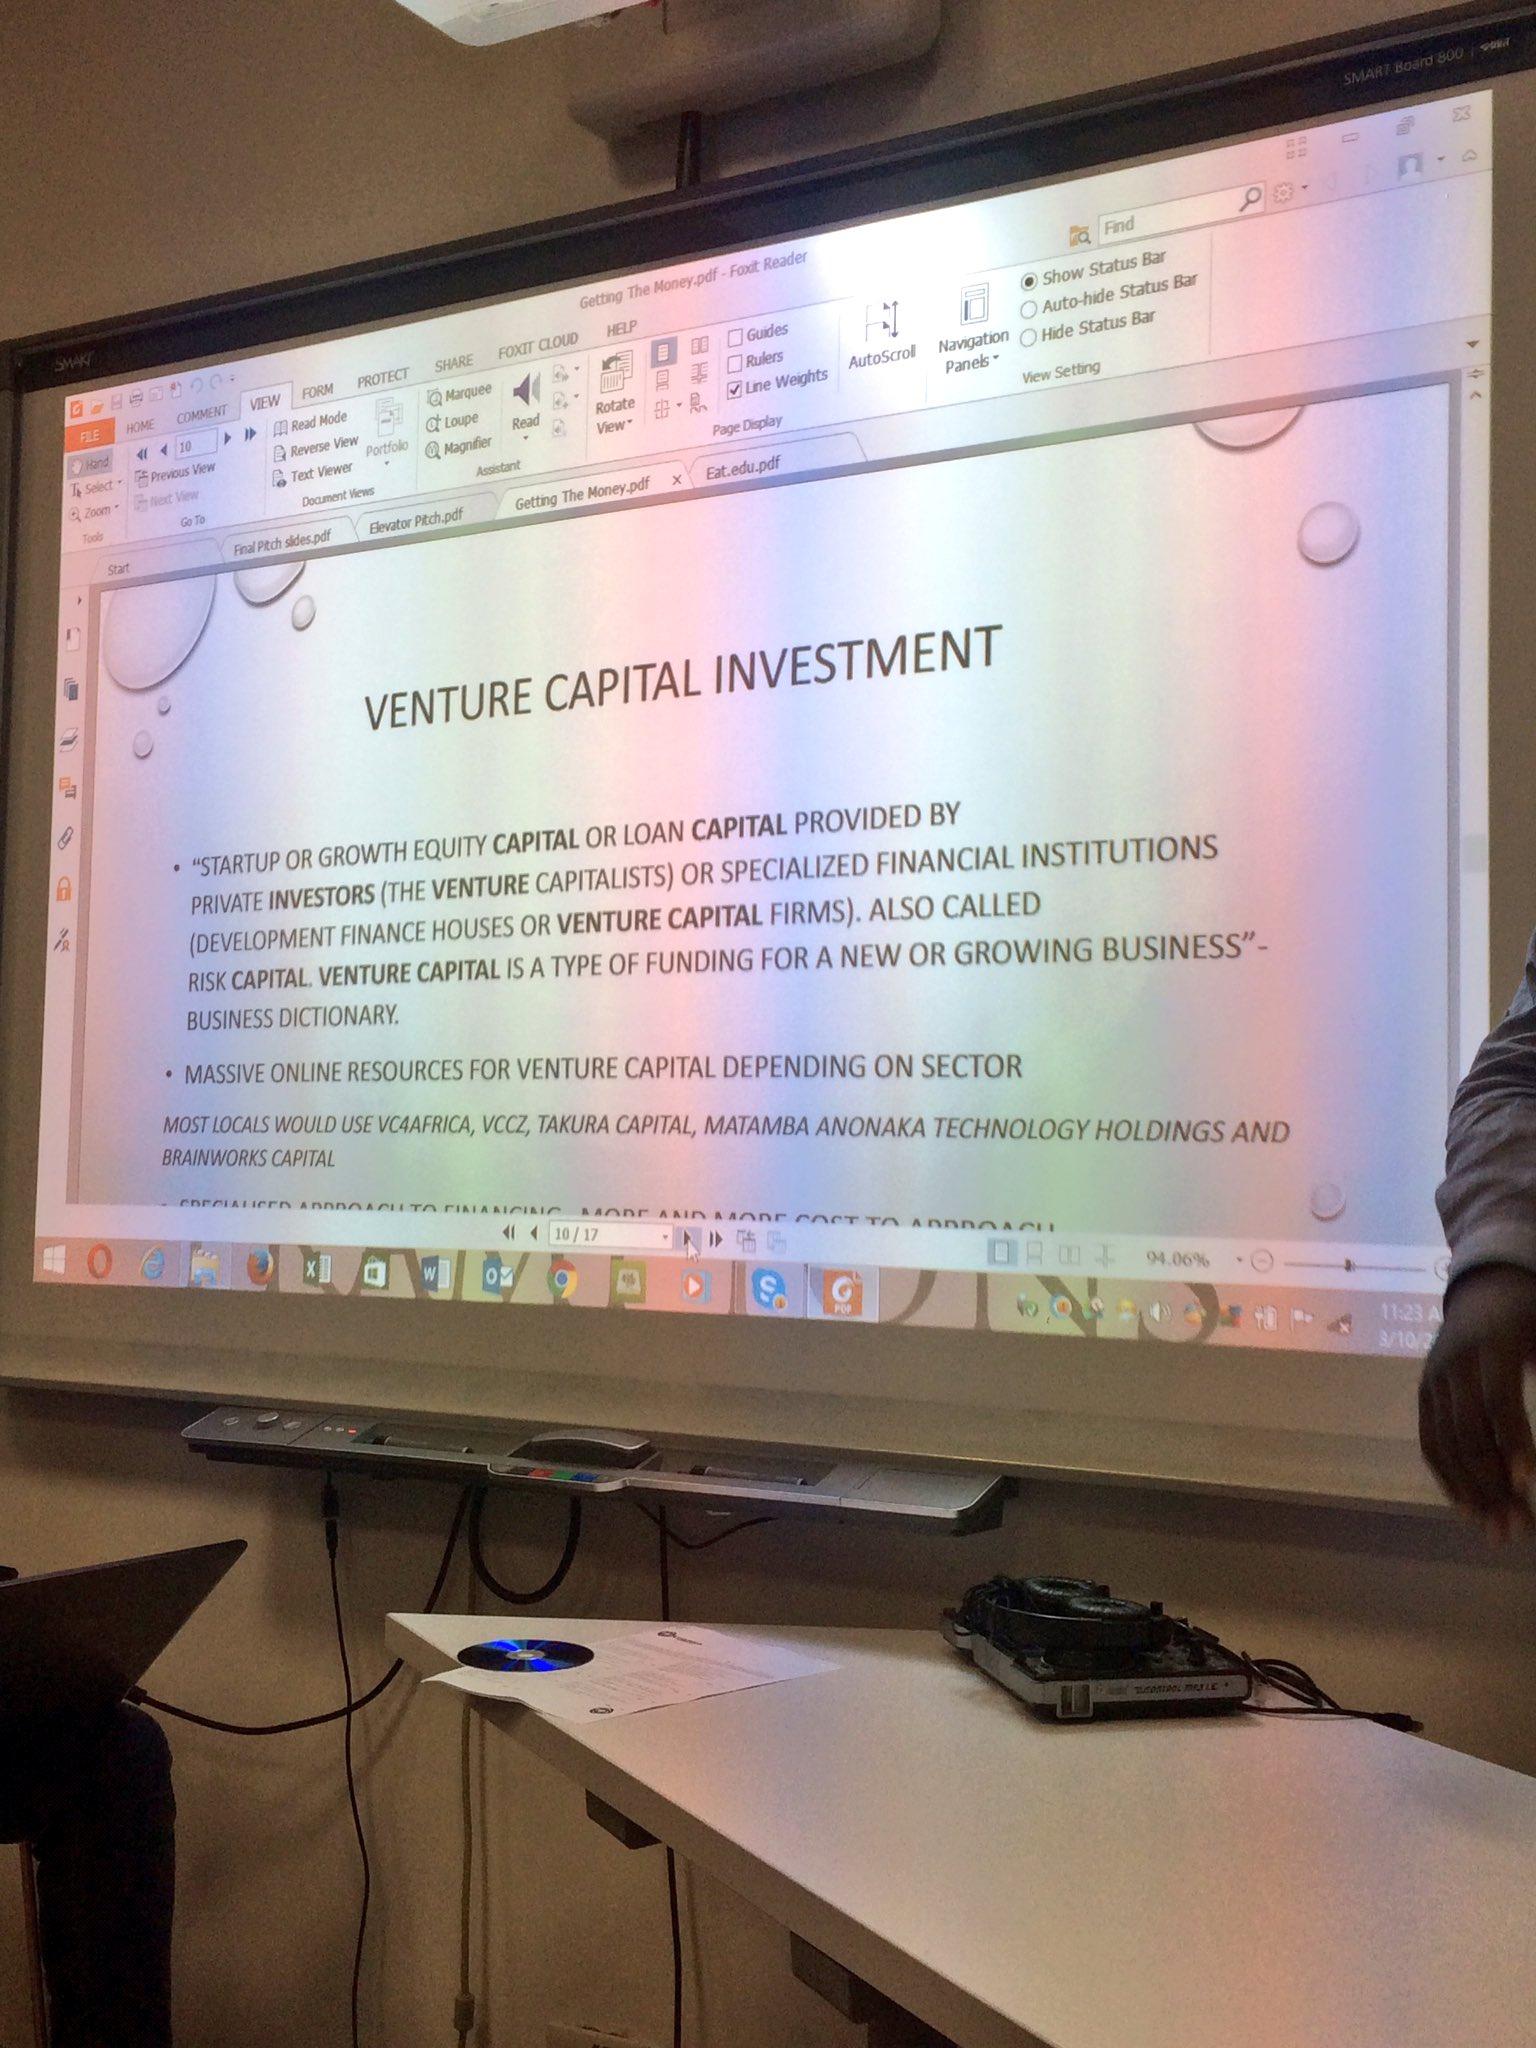 Getting the funding Solution 4 - Venture Capital @TangaiDavid #jumpstartbyo https://t.co/kMxvGorokX